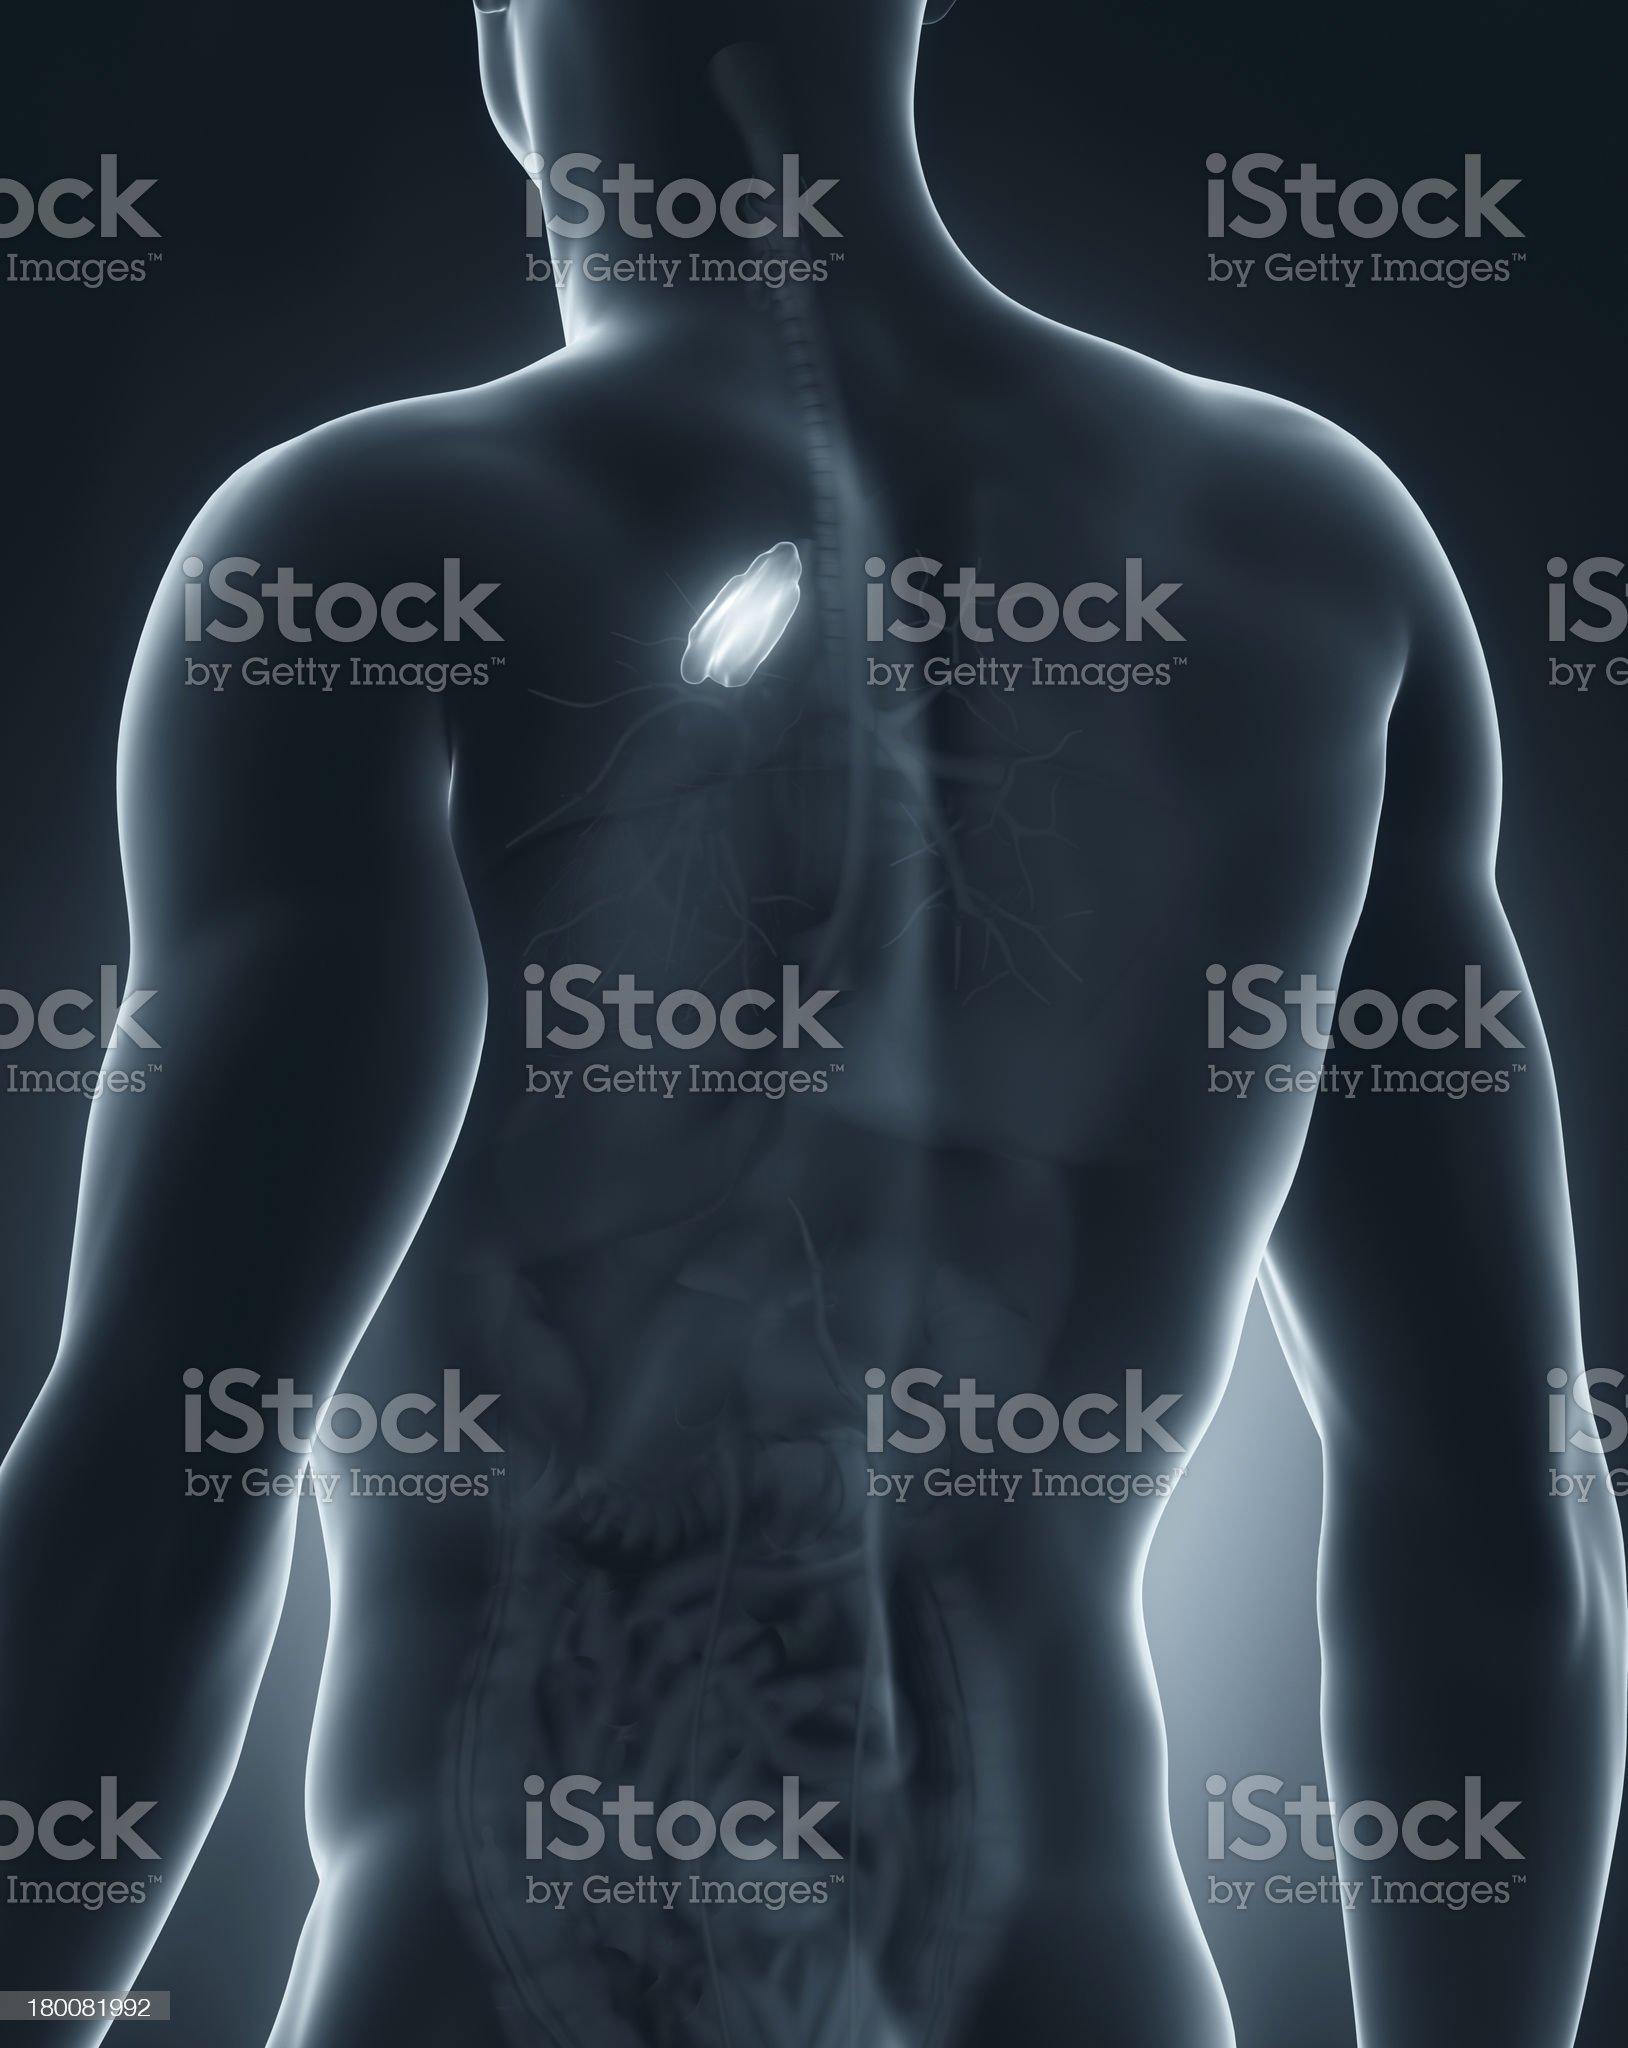 Male thymus anatomy posterior view royalty-free stock photo